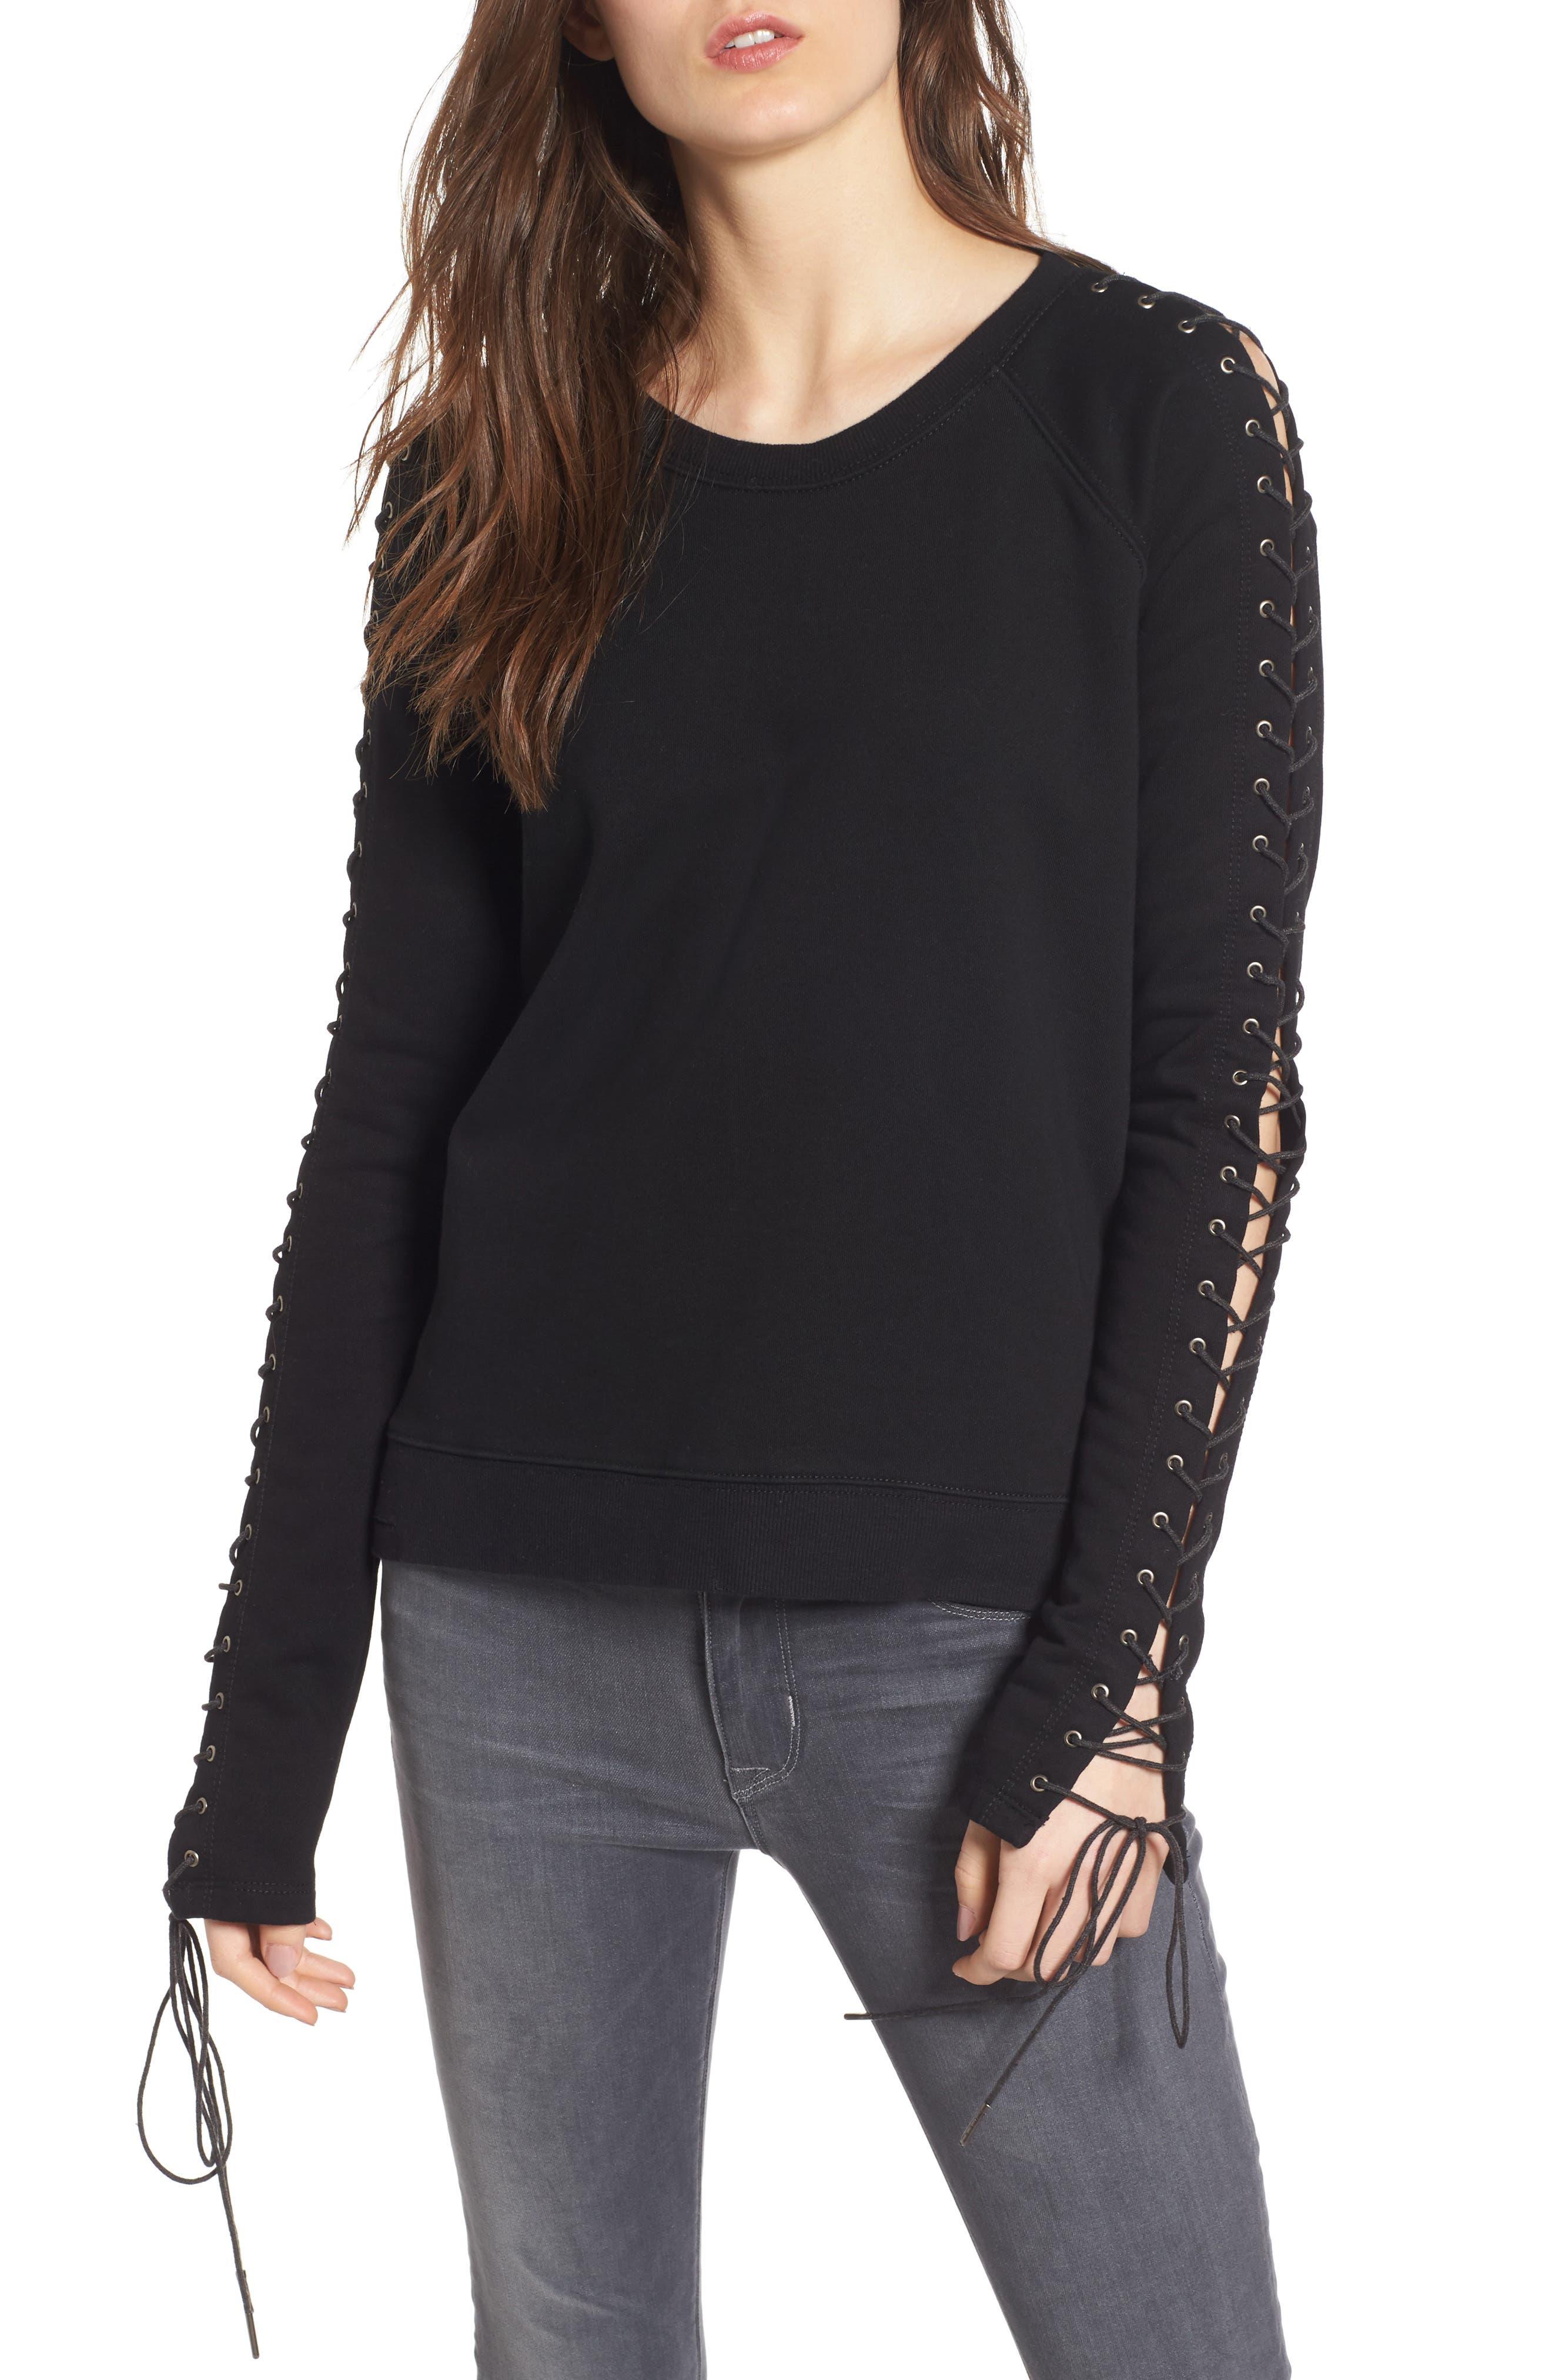 Alternate Image 1 Selected - Pam & Gela Lace-Up Sleeve Sweatshirt